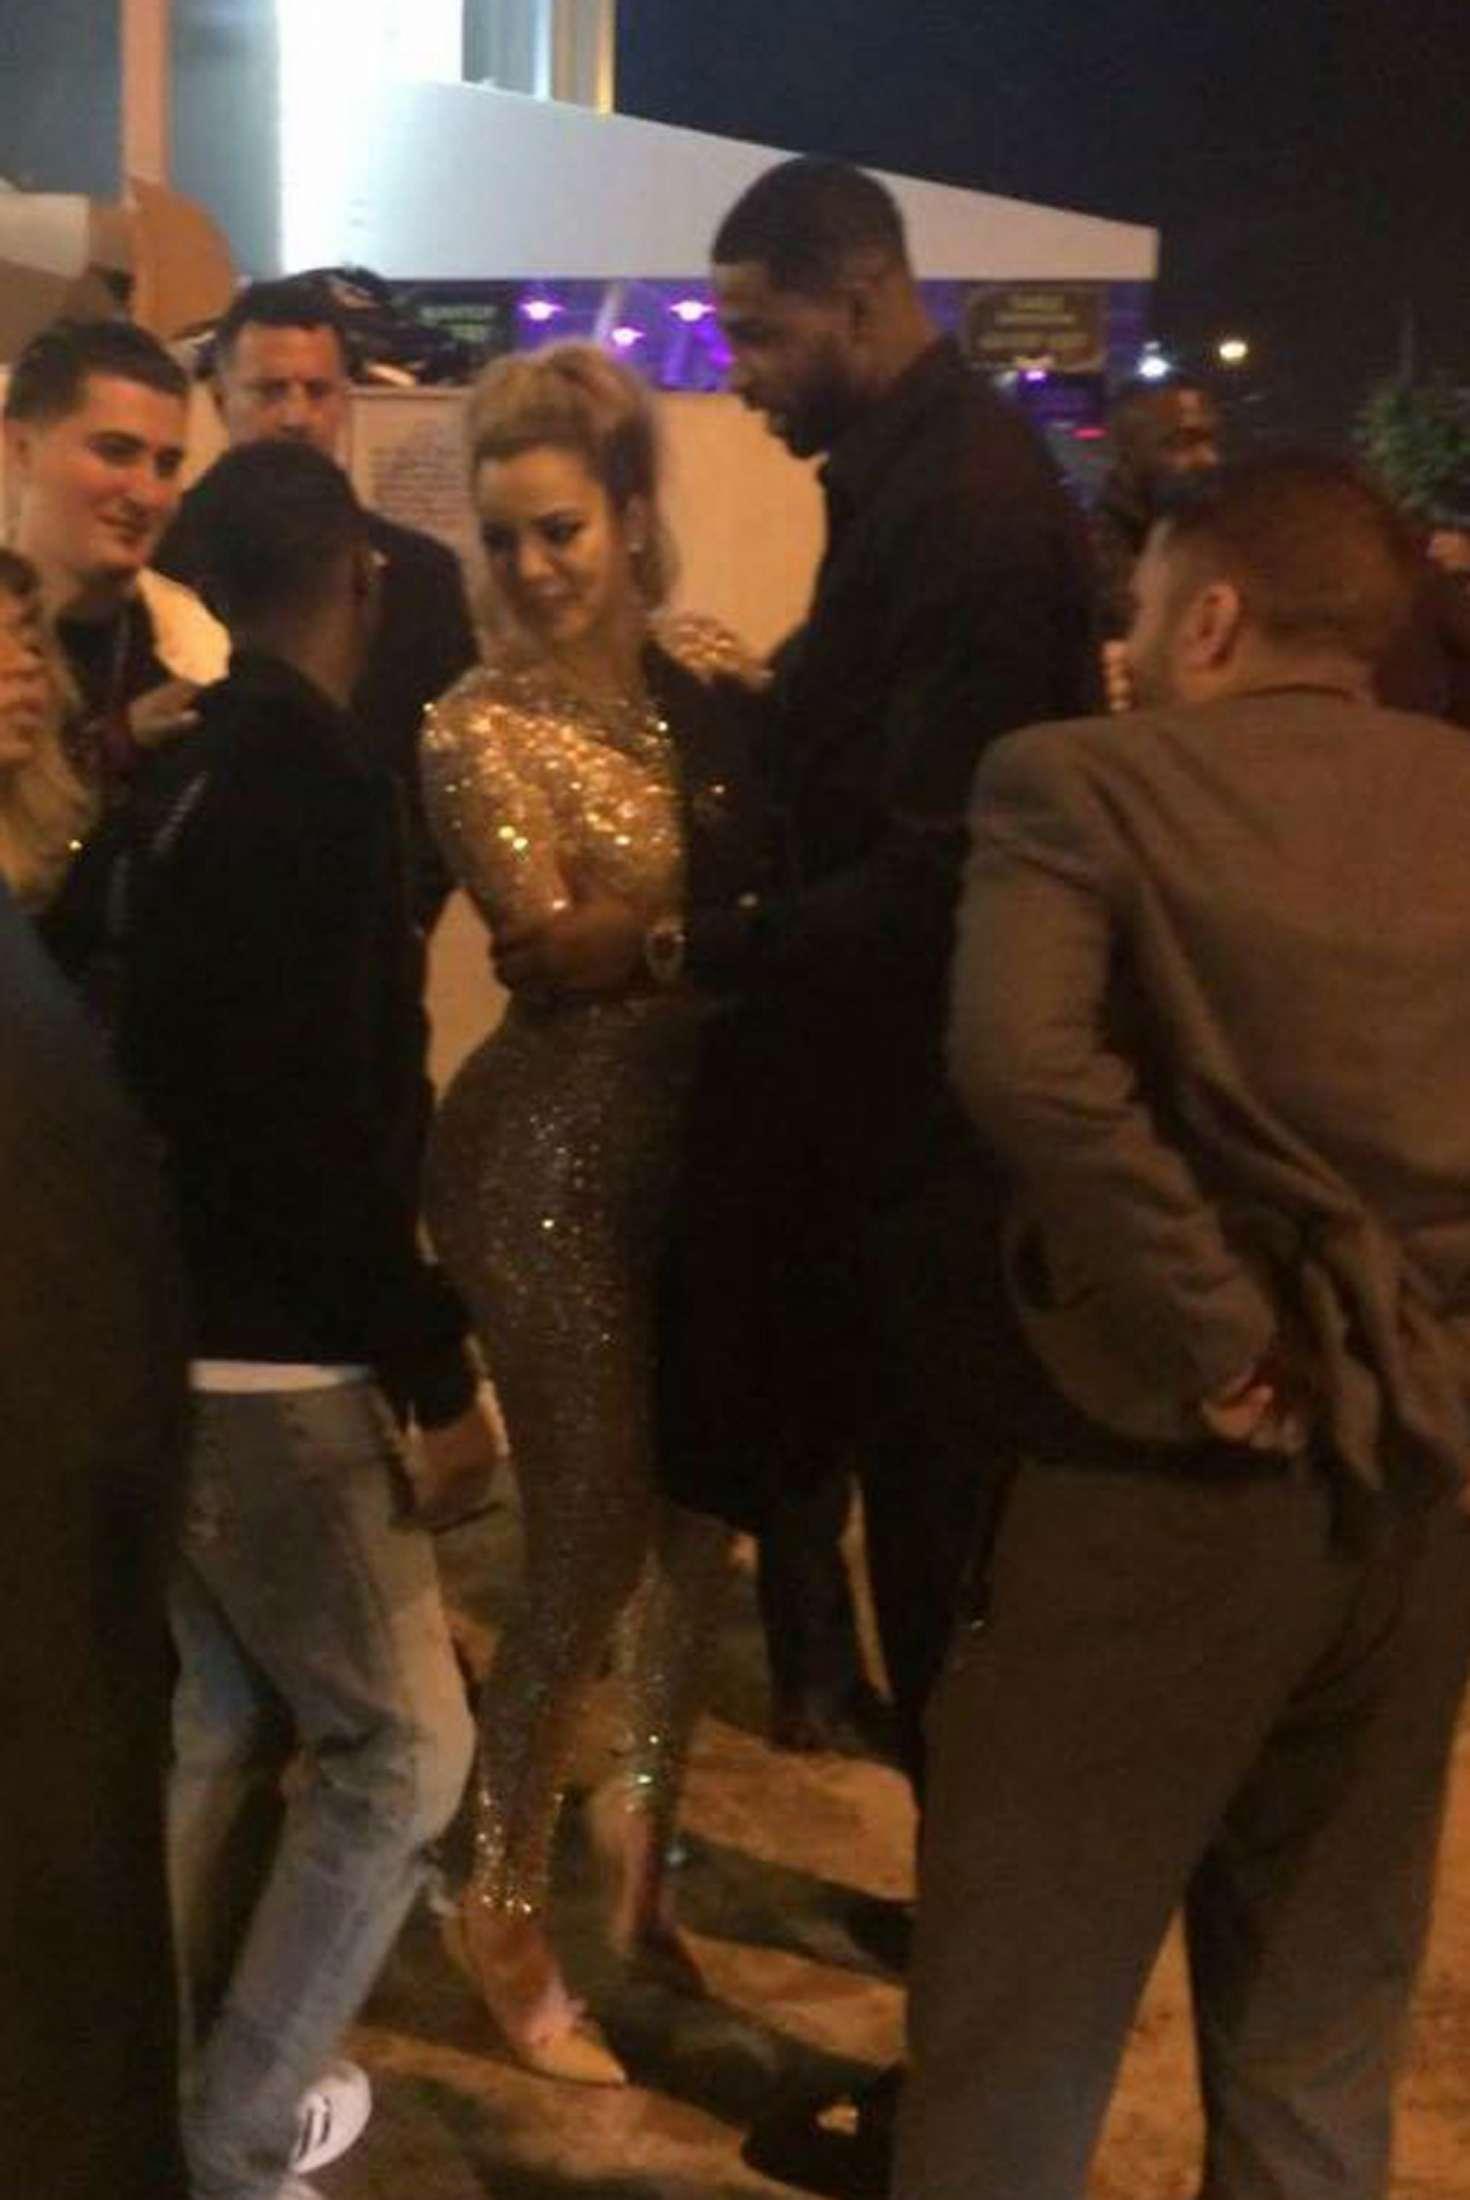 Khloe Kardashian 2017 : Khloe Kardashian at Club Space in Miami -03